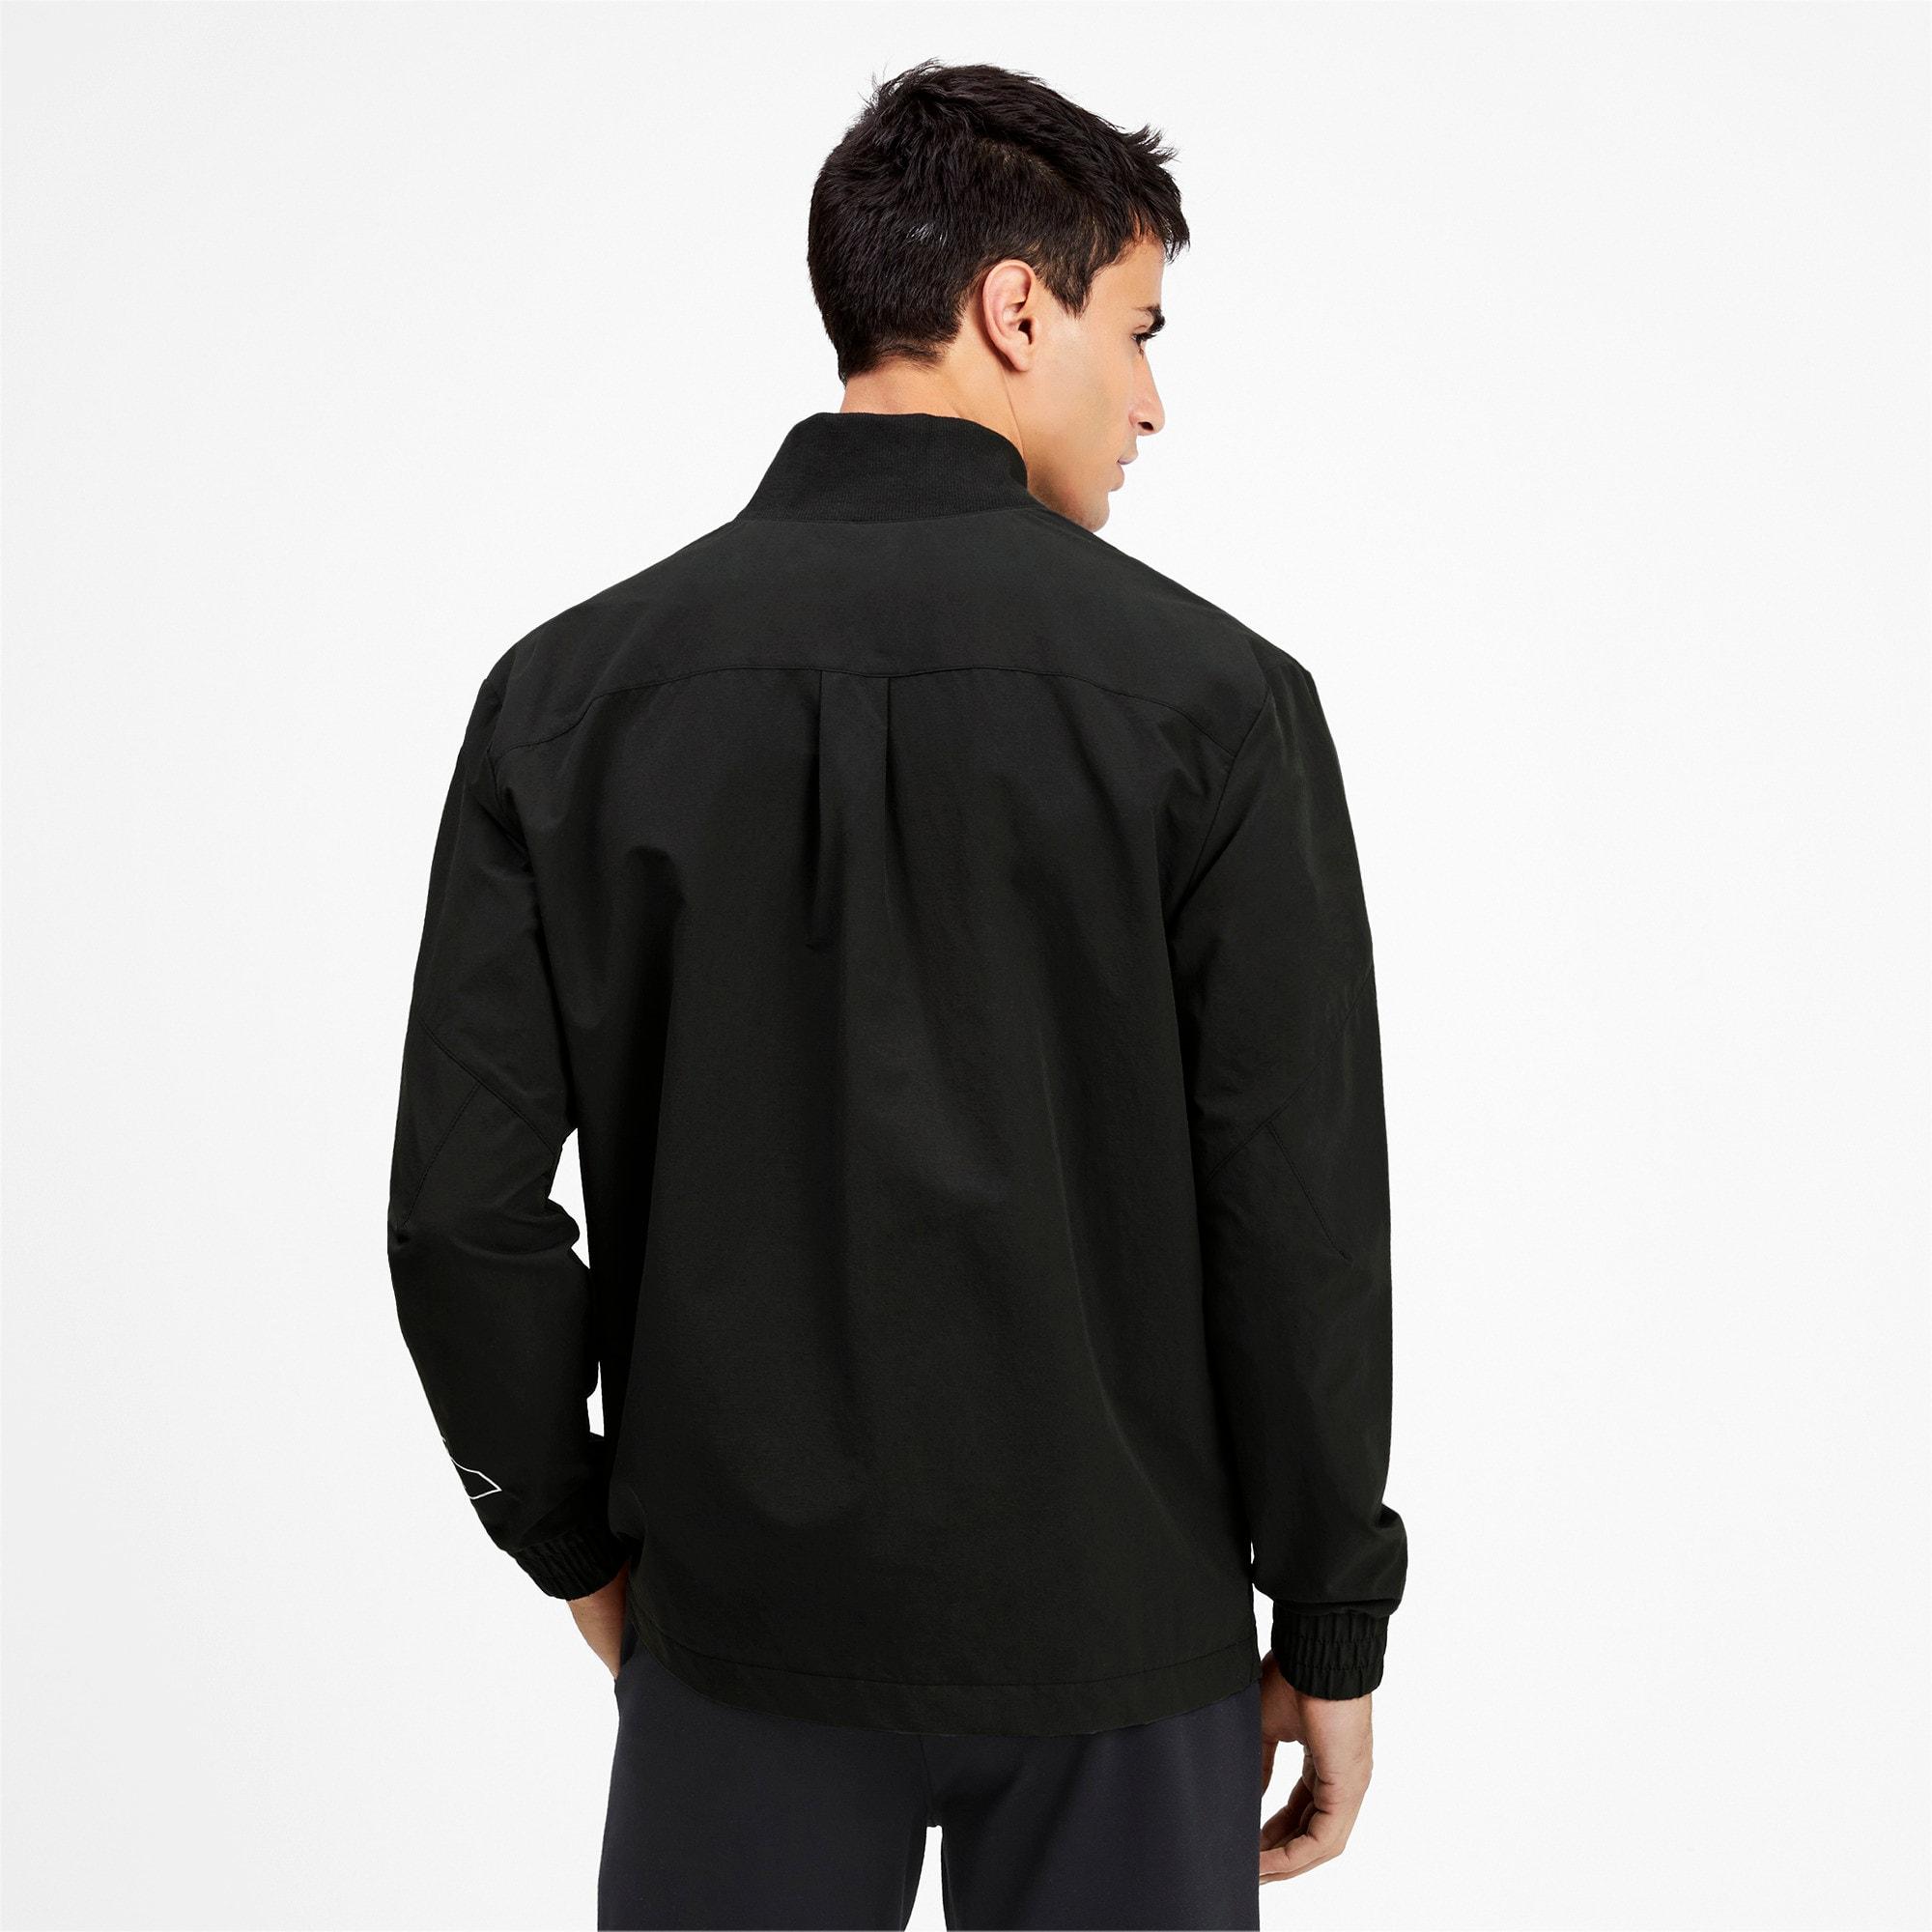 Miniatura 2 de Chaqueta tejida NU-TILITY para hombre, Puma Black, mediano